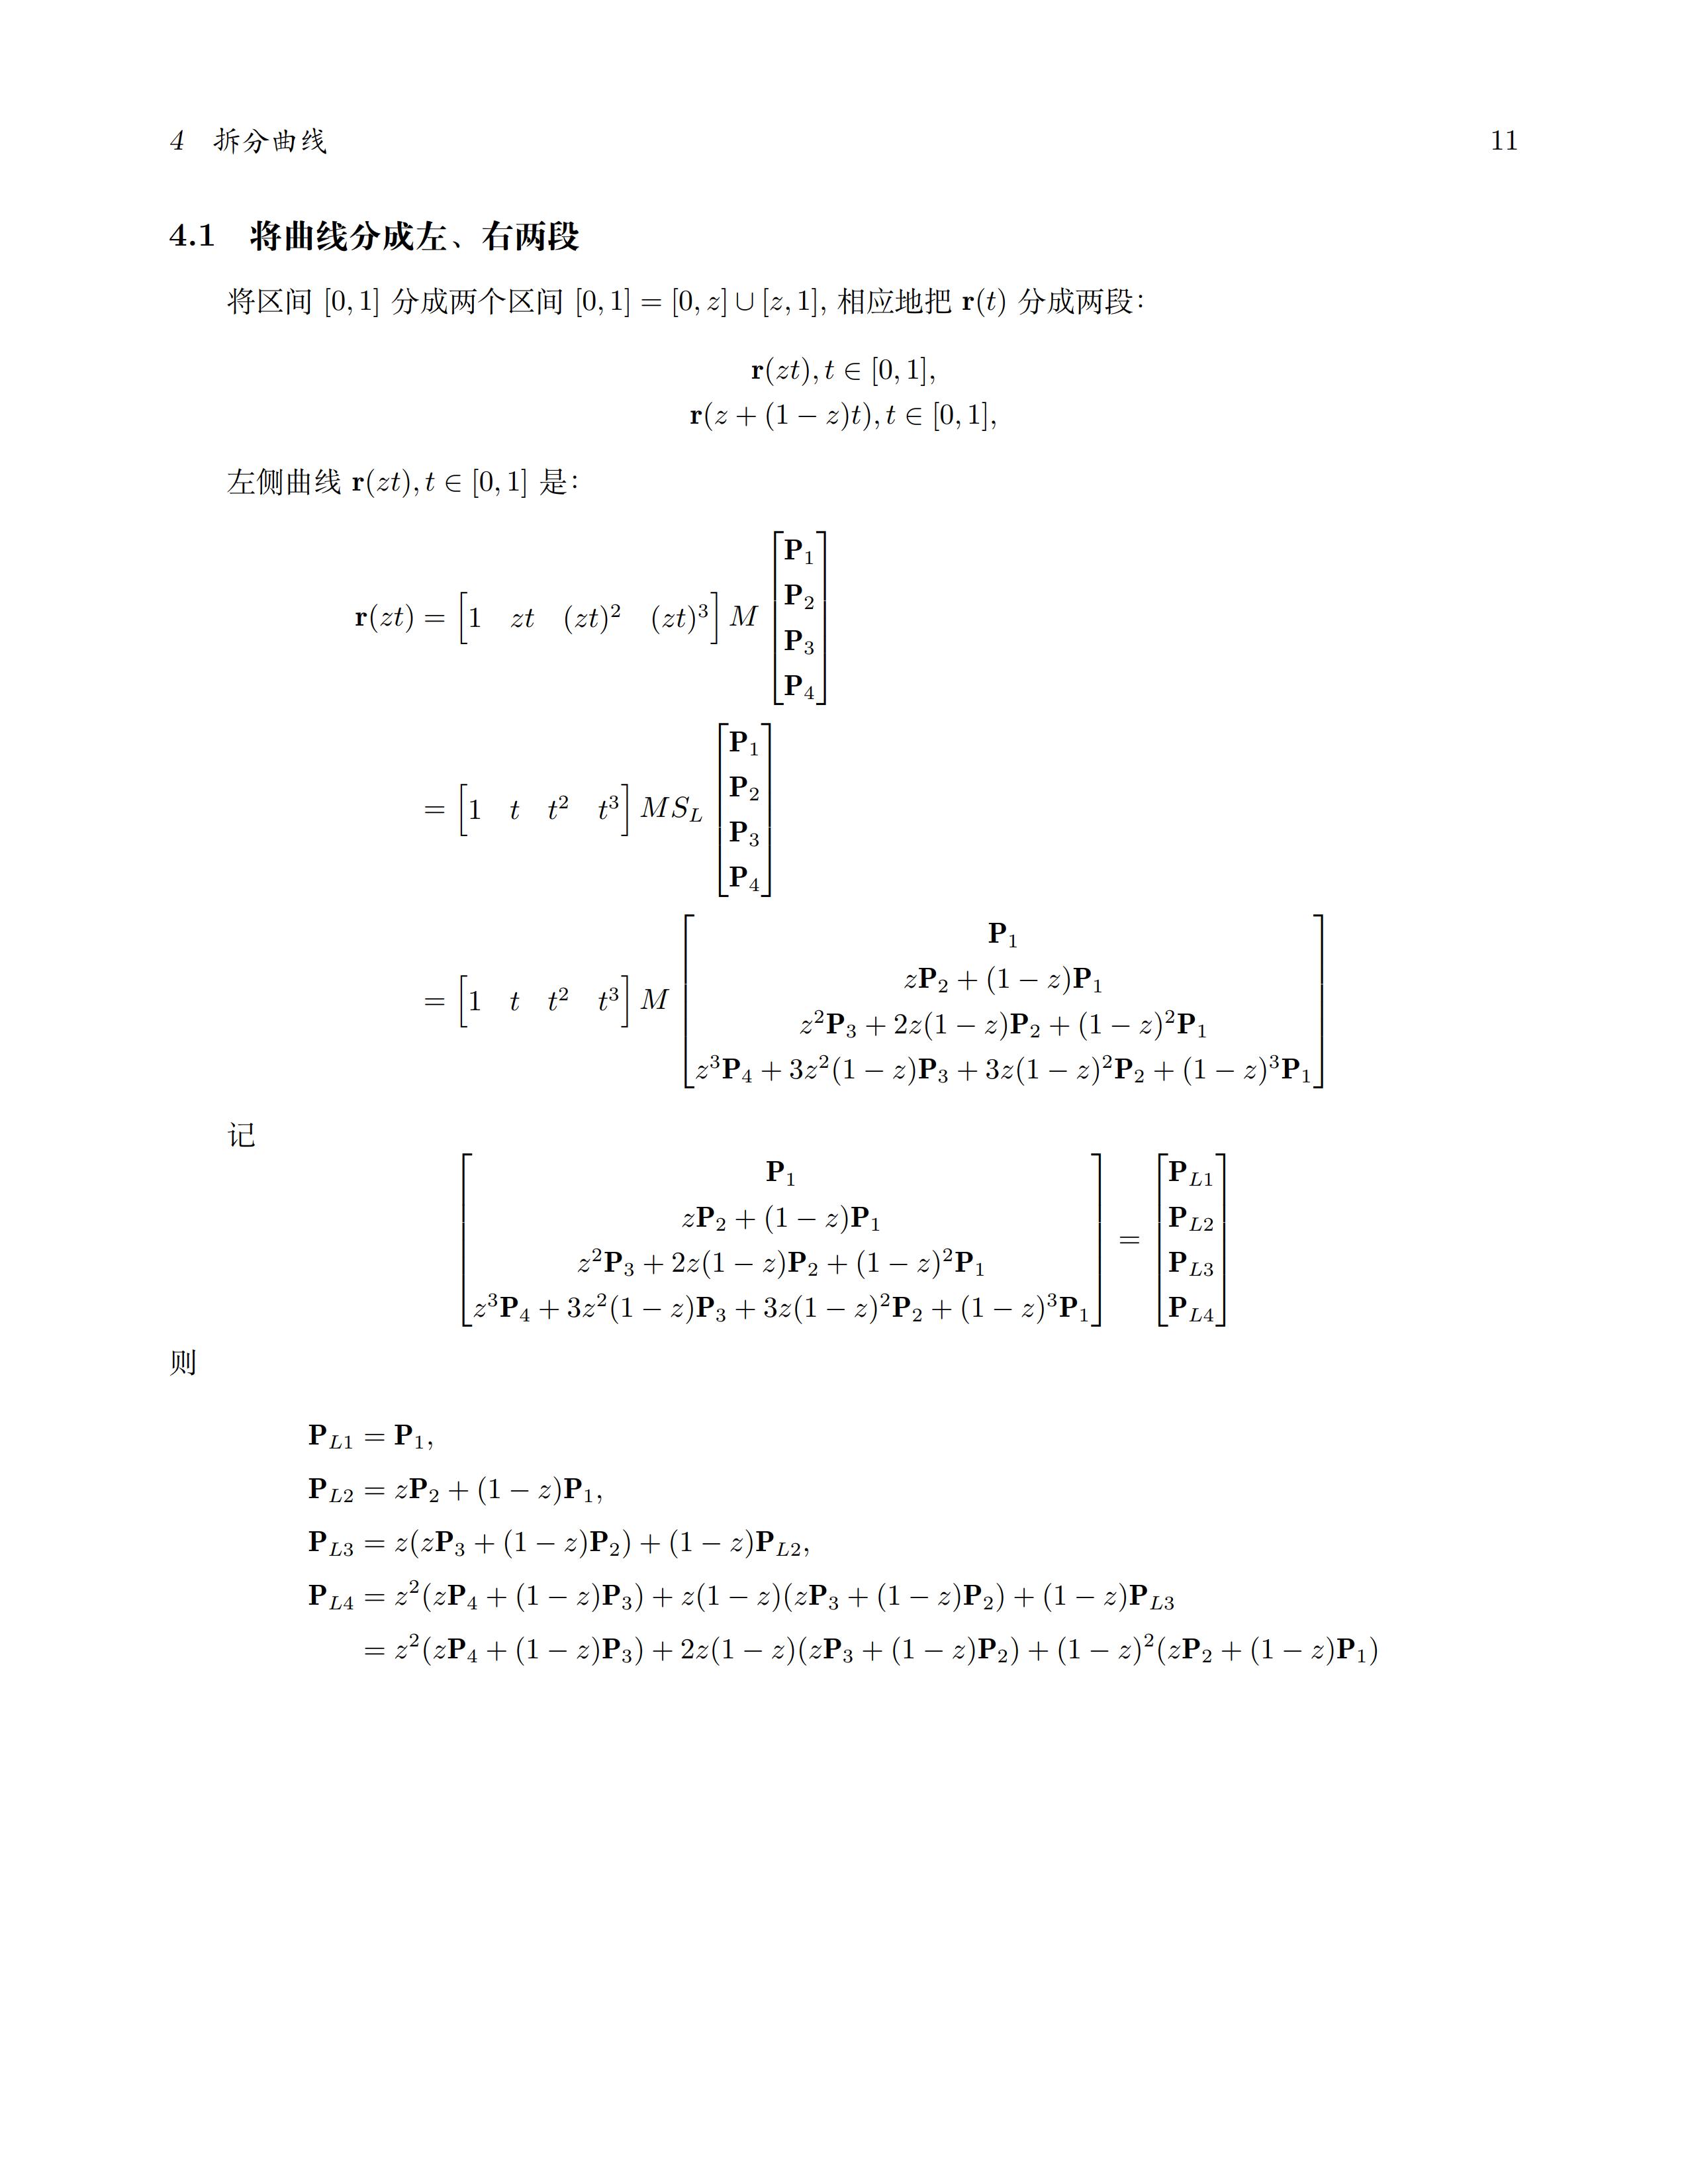 TikZ 做的曲线计算工具